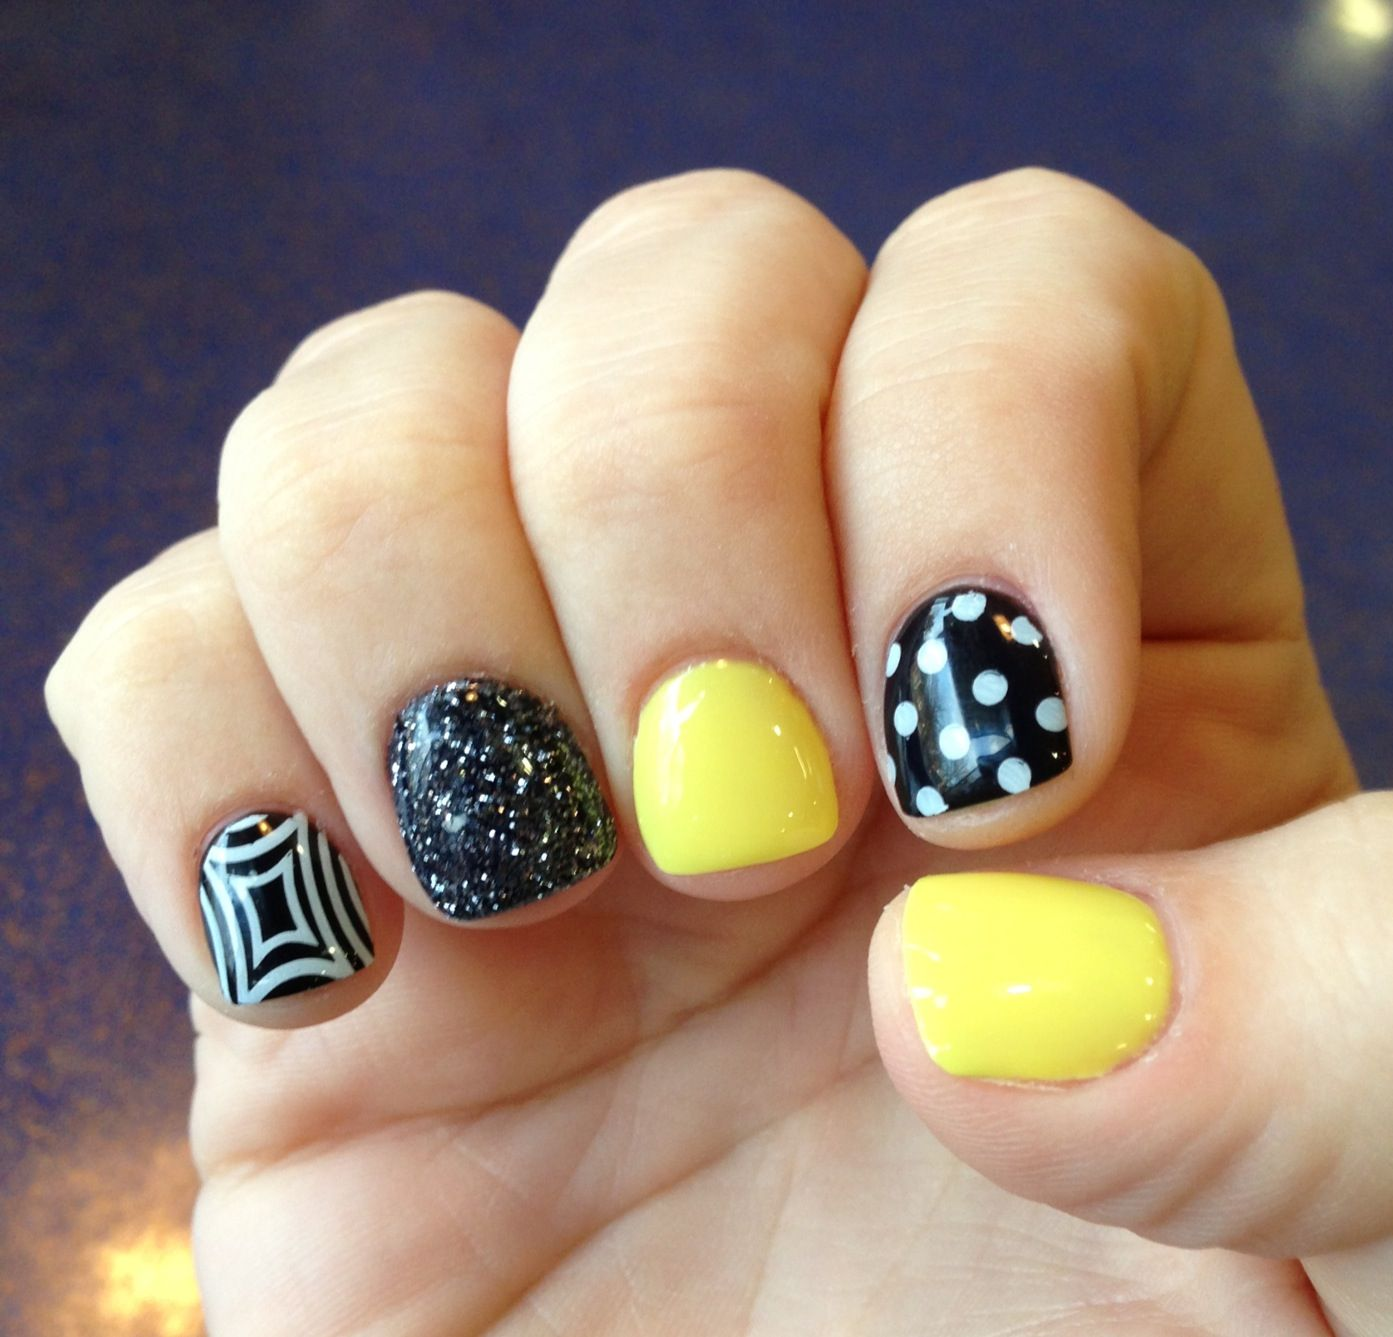 Black and yellow nail art gel manicure | Nail art | Pinterest